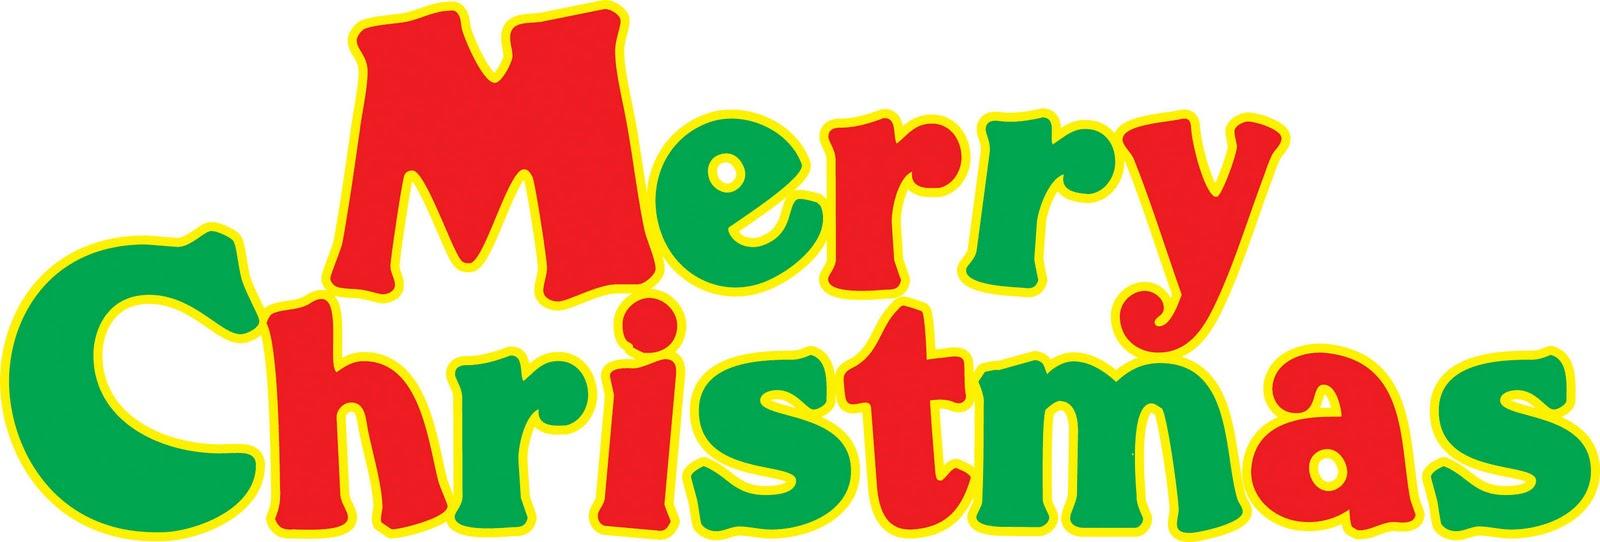 1600x542 Christmas Clipart Merry Christmas